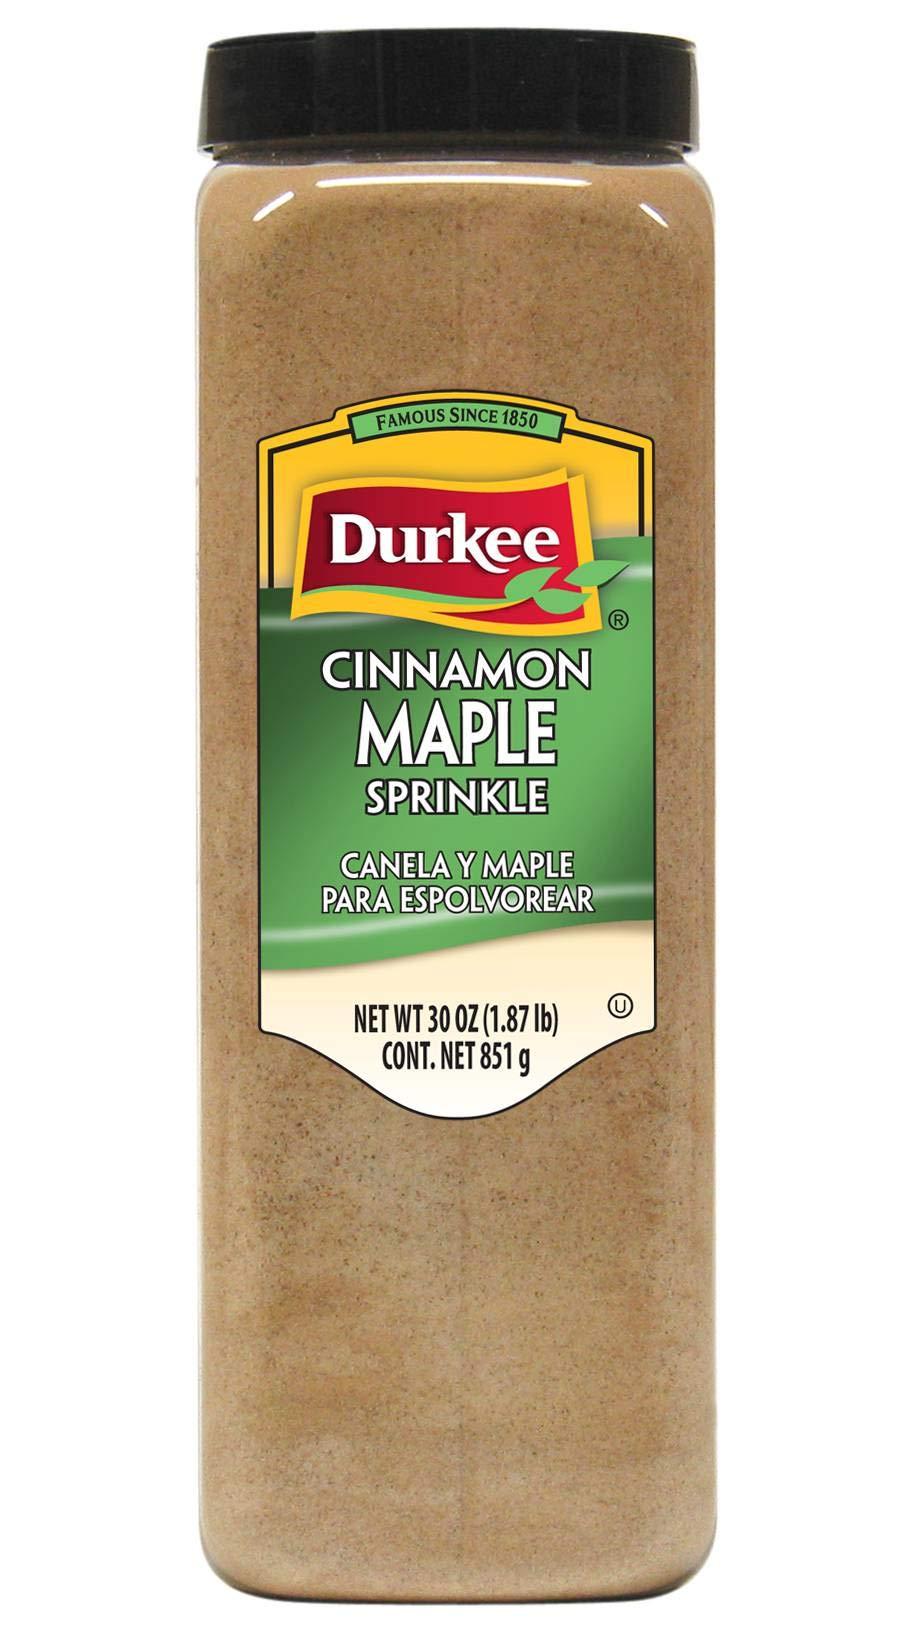 Durkee Cinnamon Maple Sprinkle - 30 oz. container, 6 per case